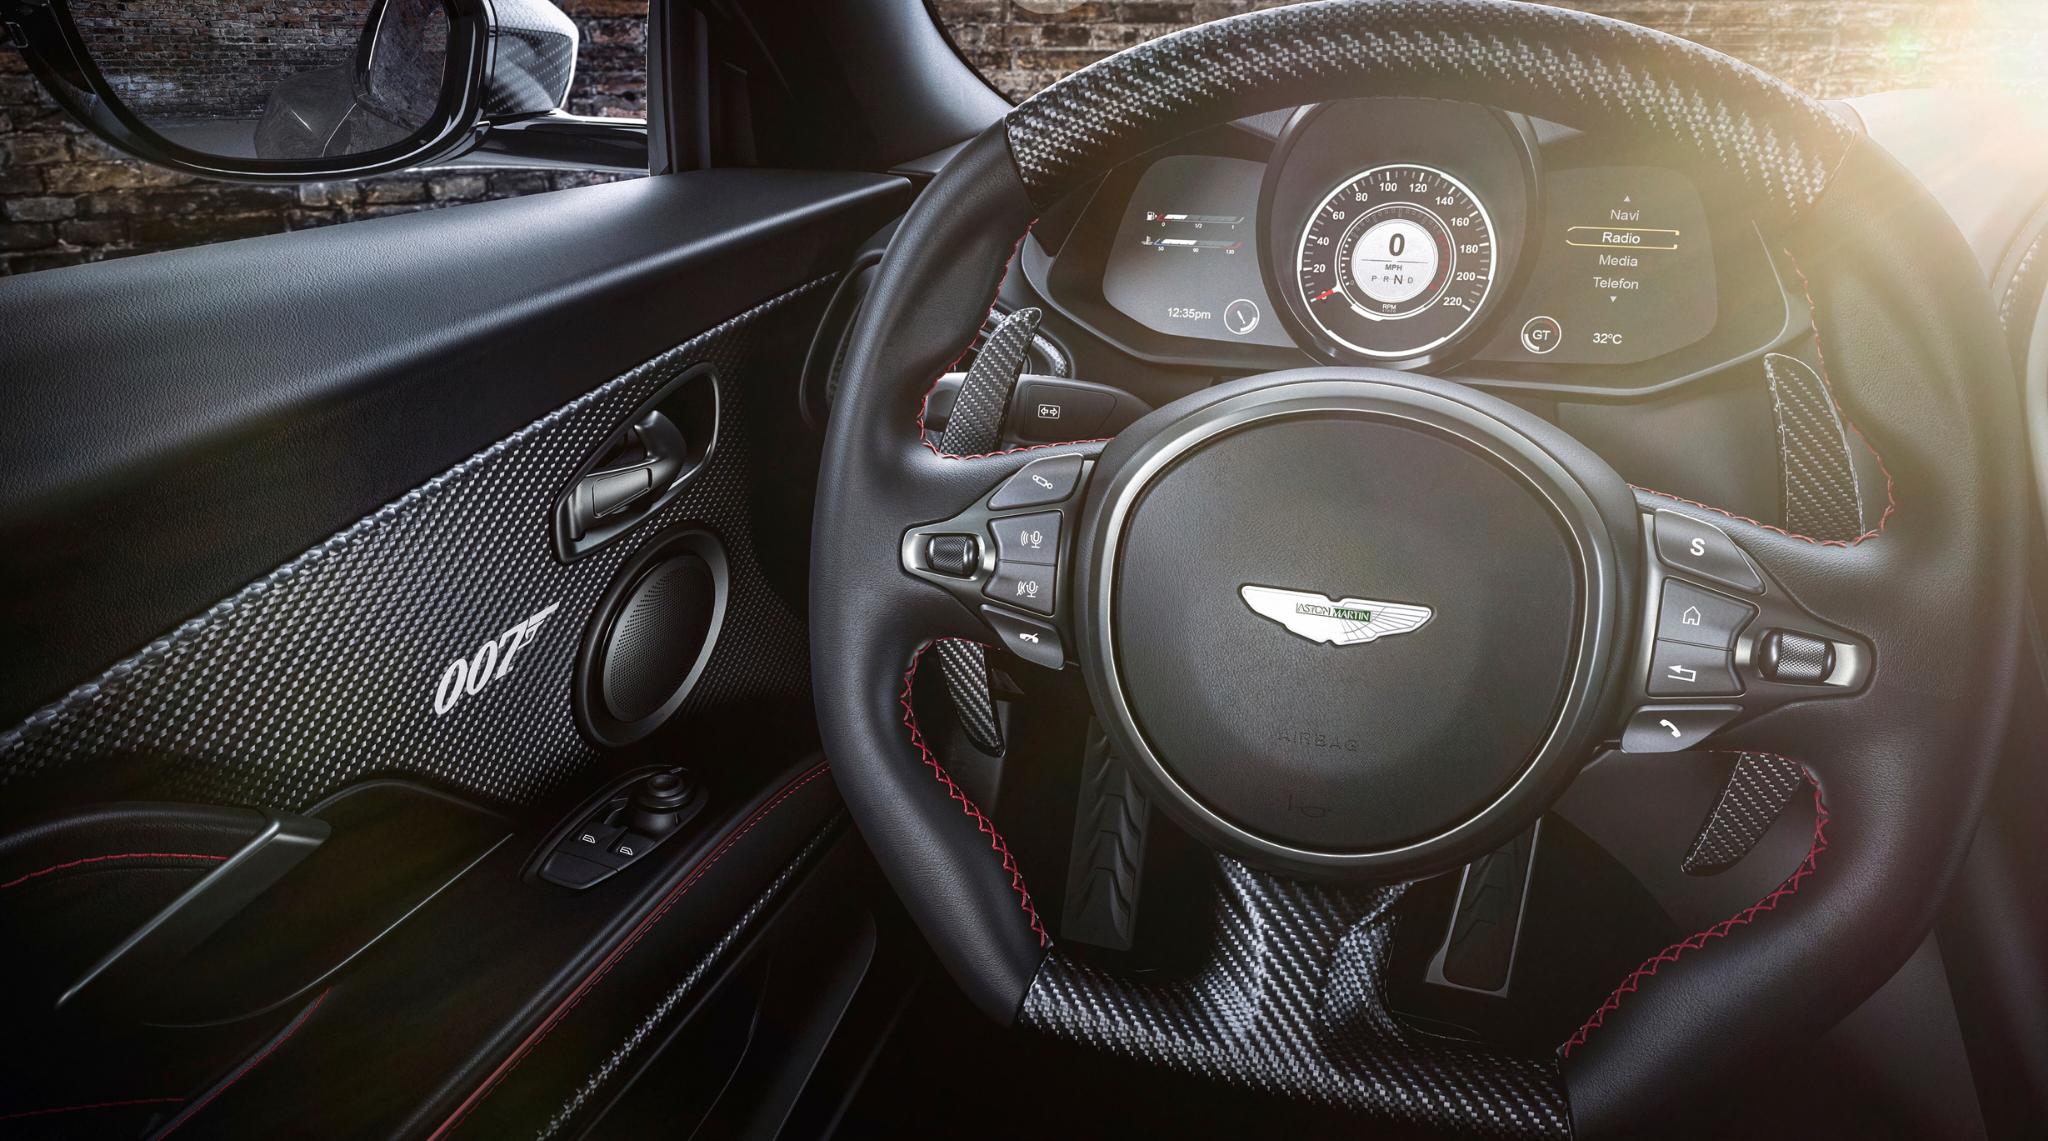 007 Aston Martin DBS Superleggera Interior